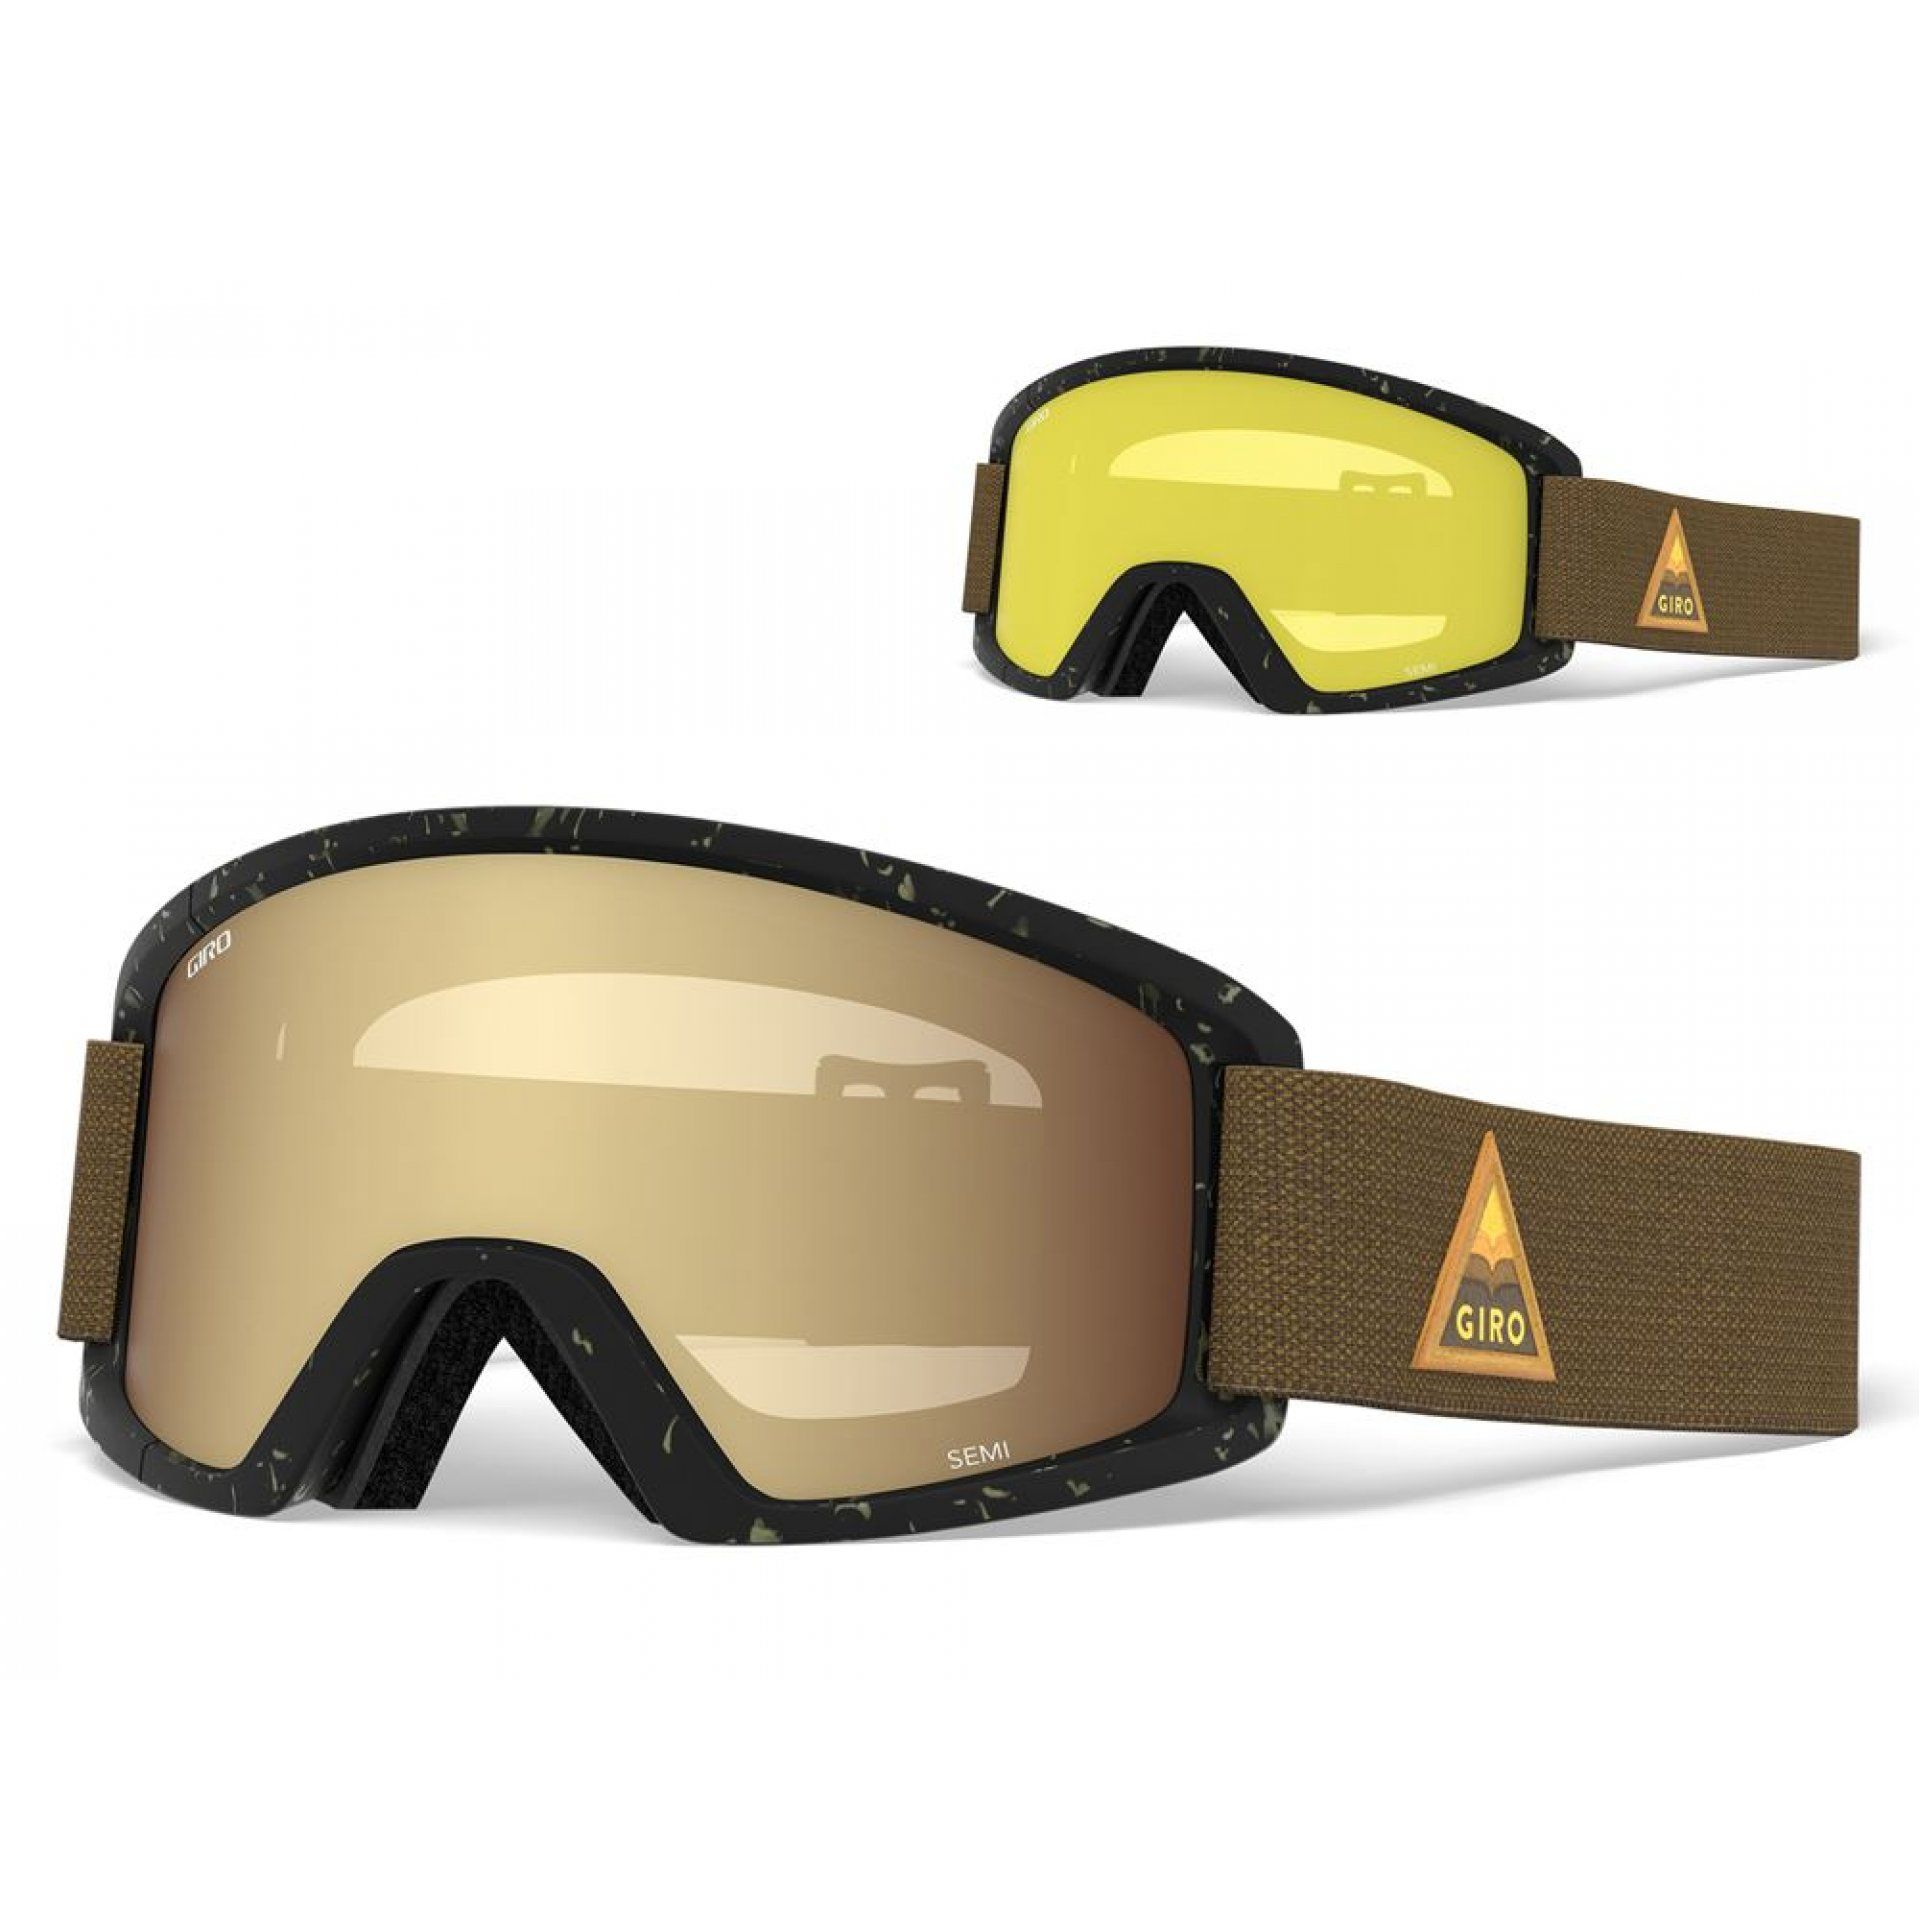 GOGLE GIRO SEMI RUST ARROW MTN|AMBER GOLD 1